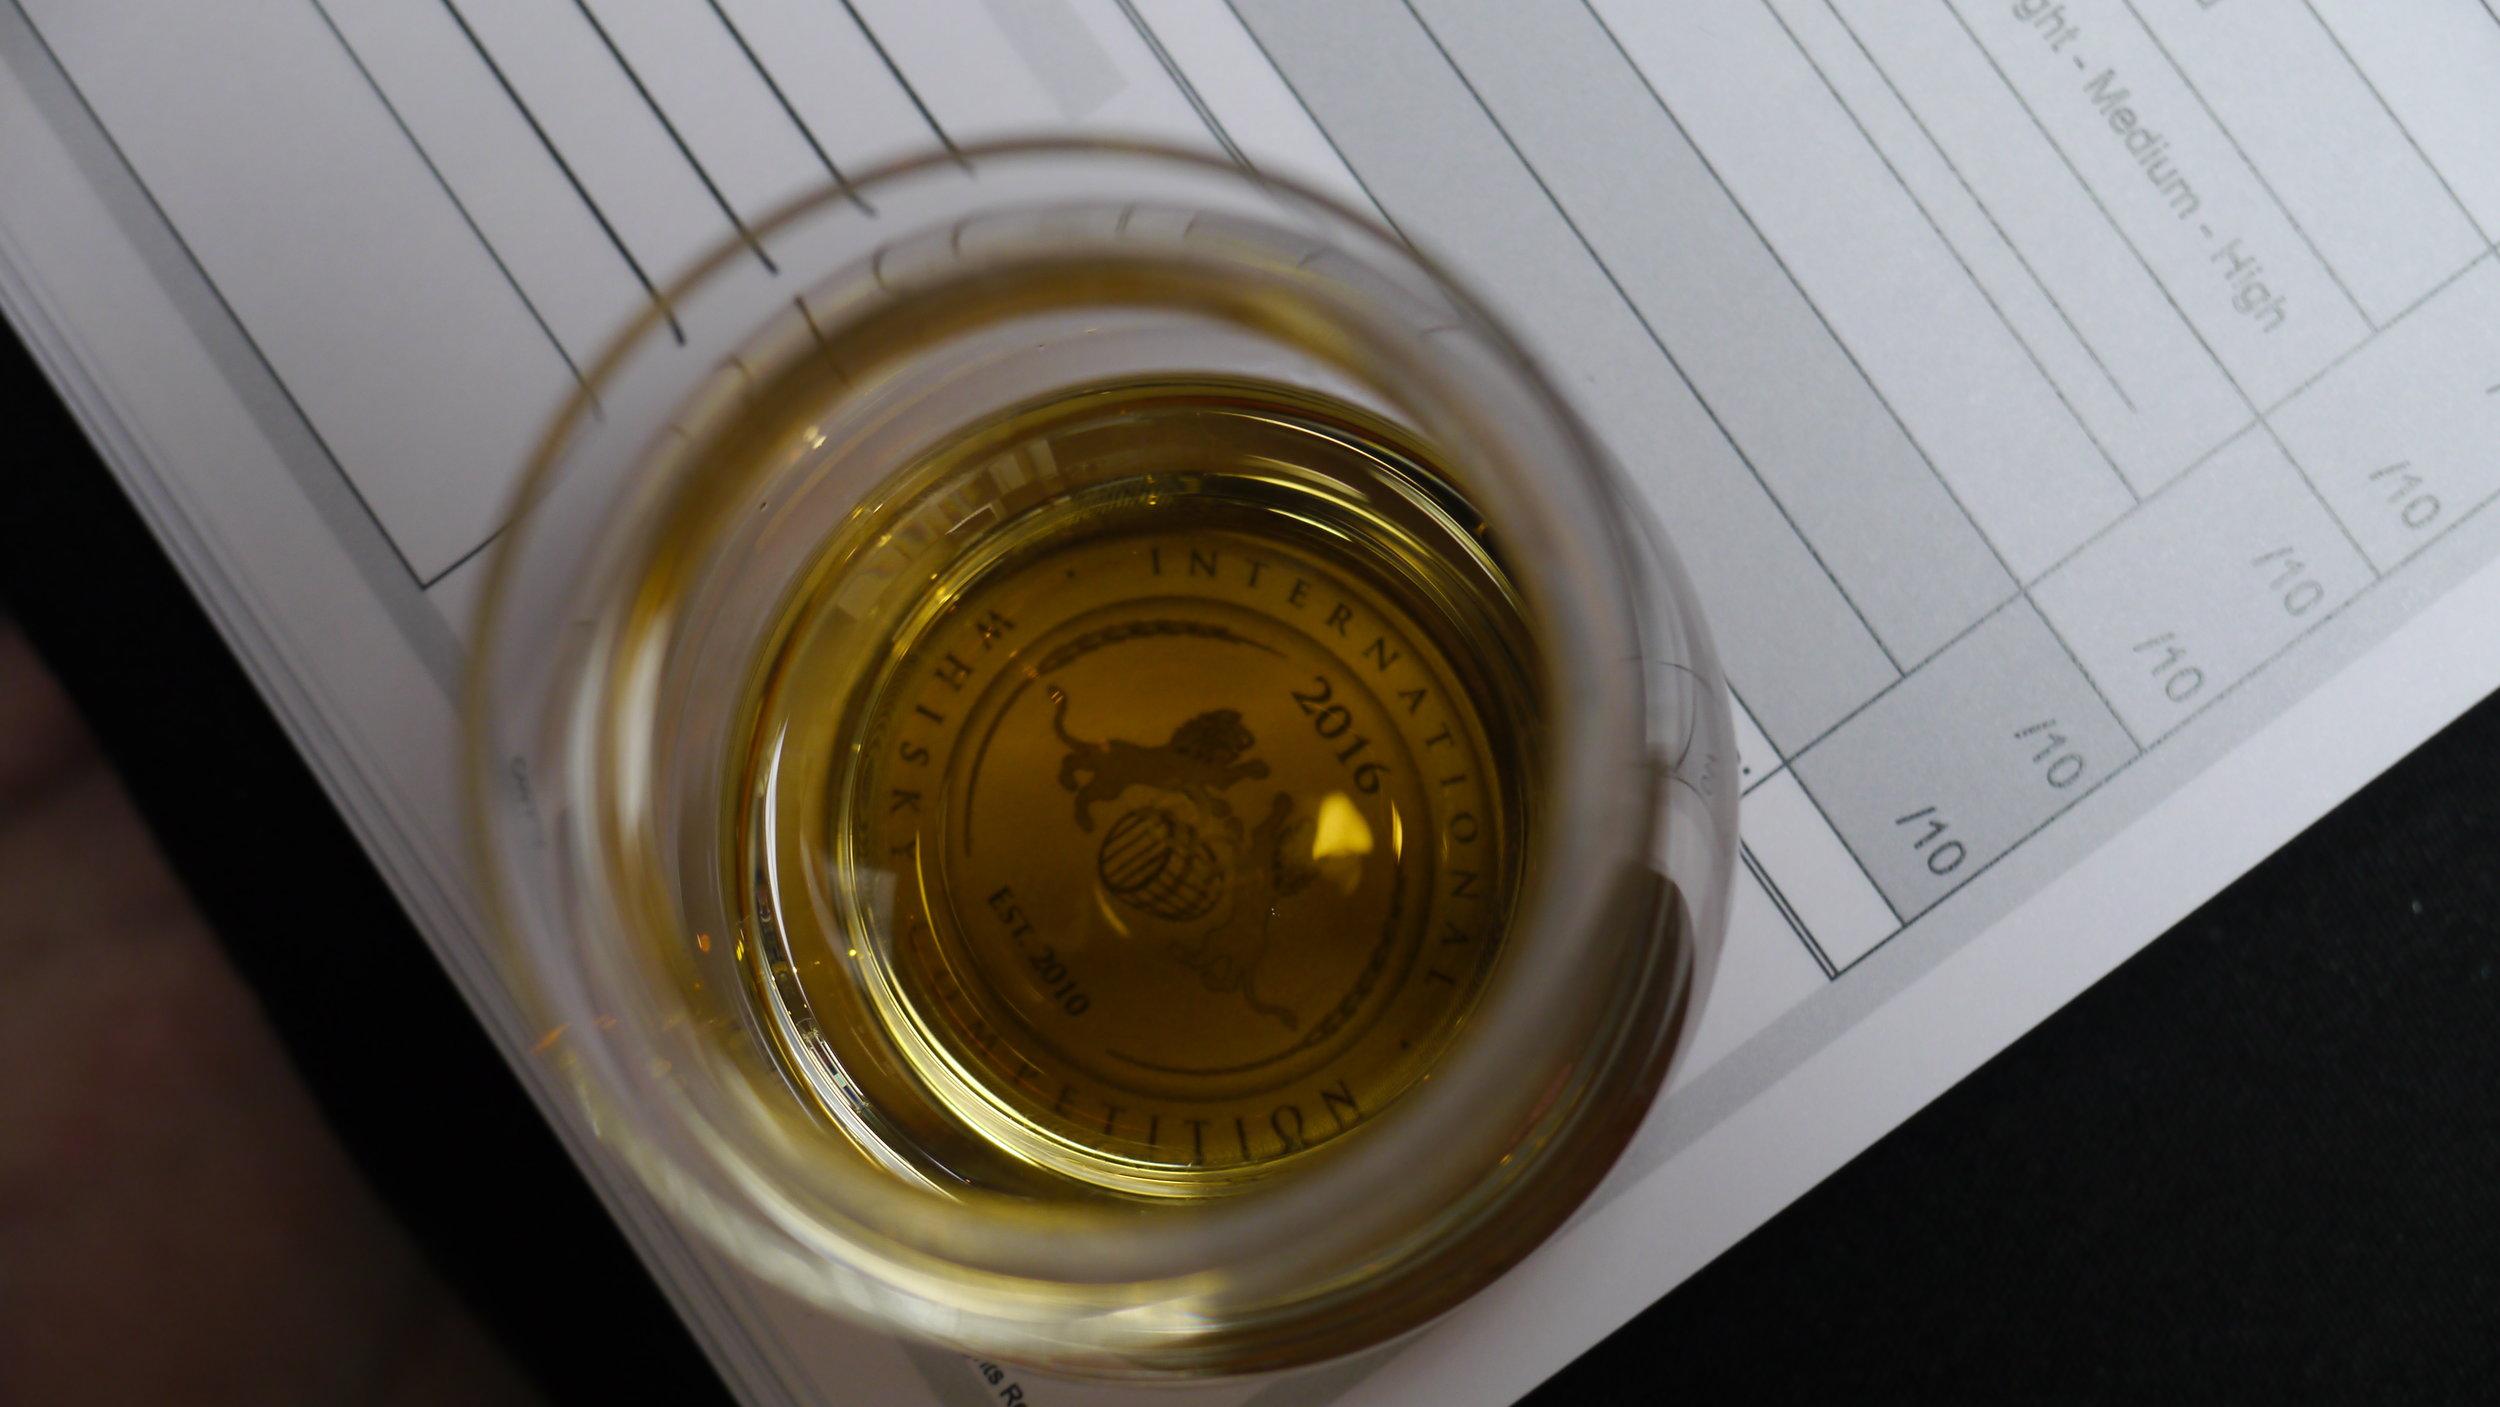 Sample overlooking the judging tasting sheet